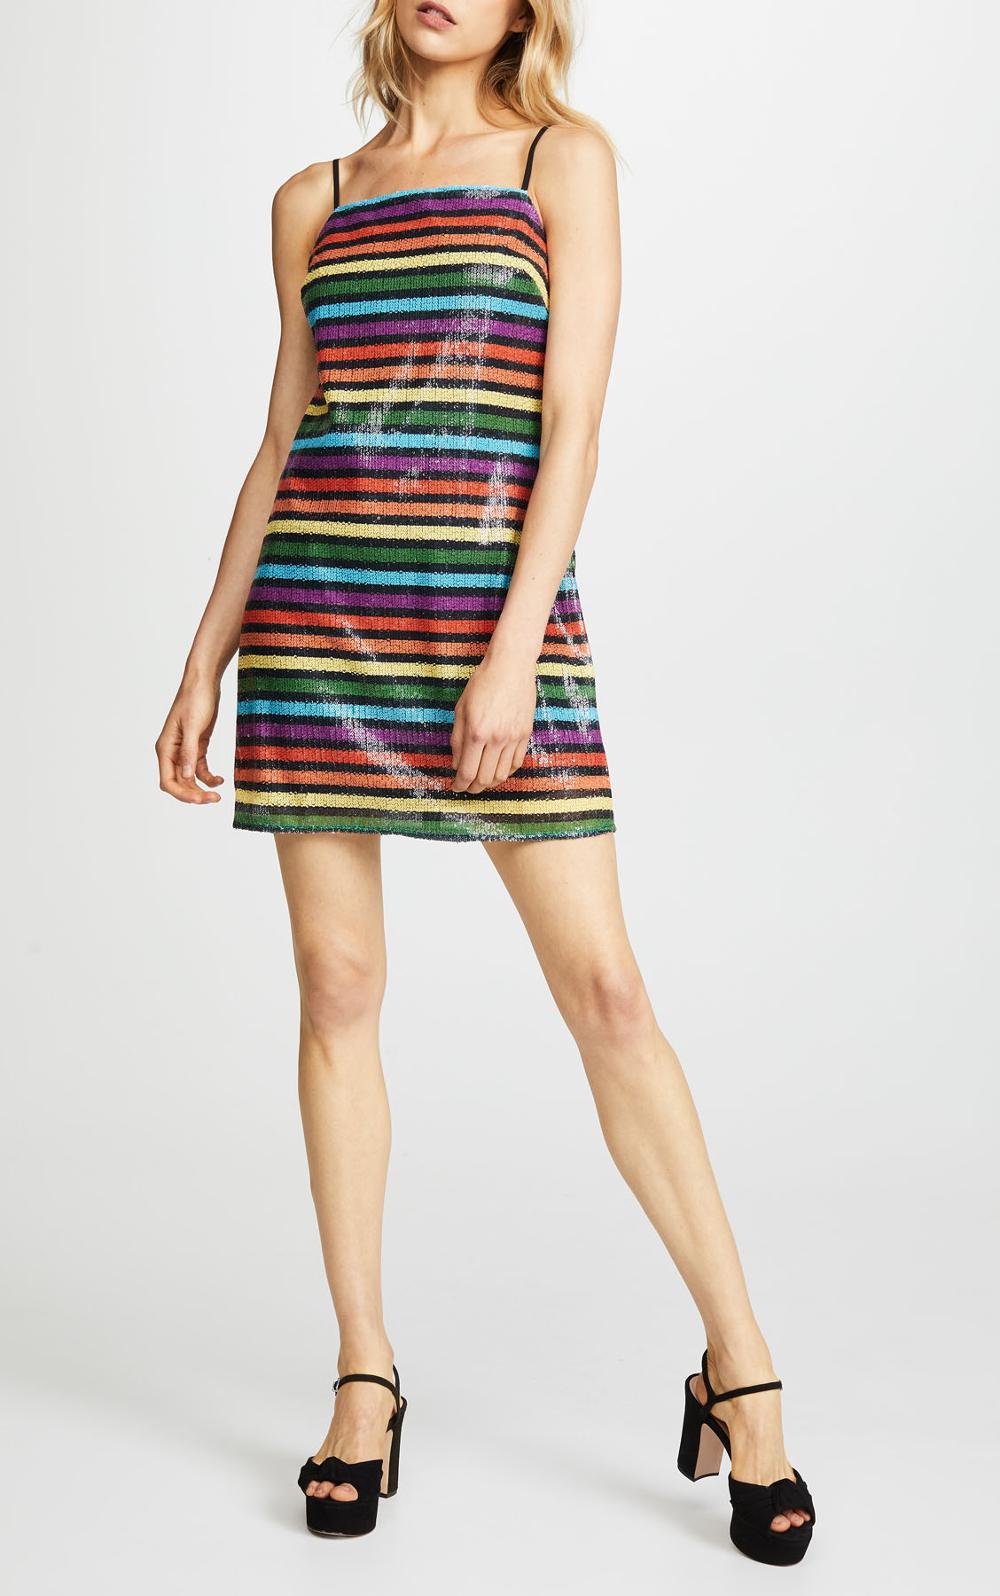 44a79fd4a651b Mini Cami Dress, Mini Cami Dress Suppliers and Manufacturers at ...